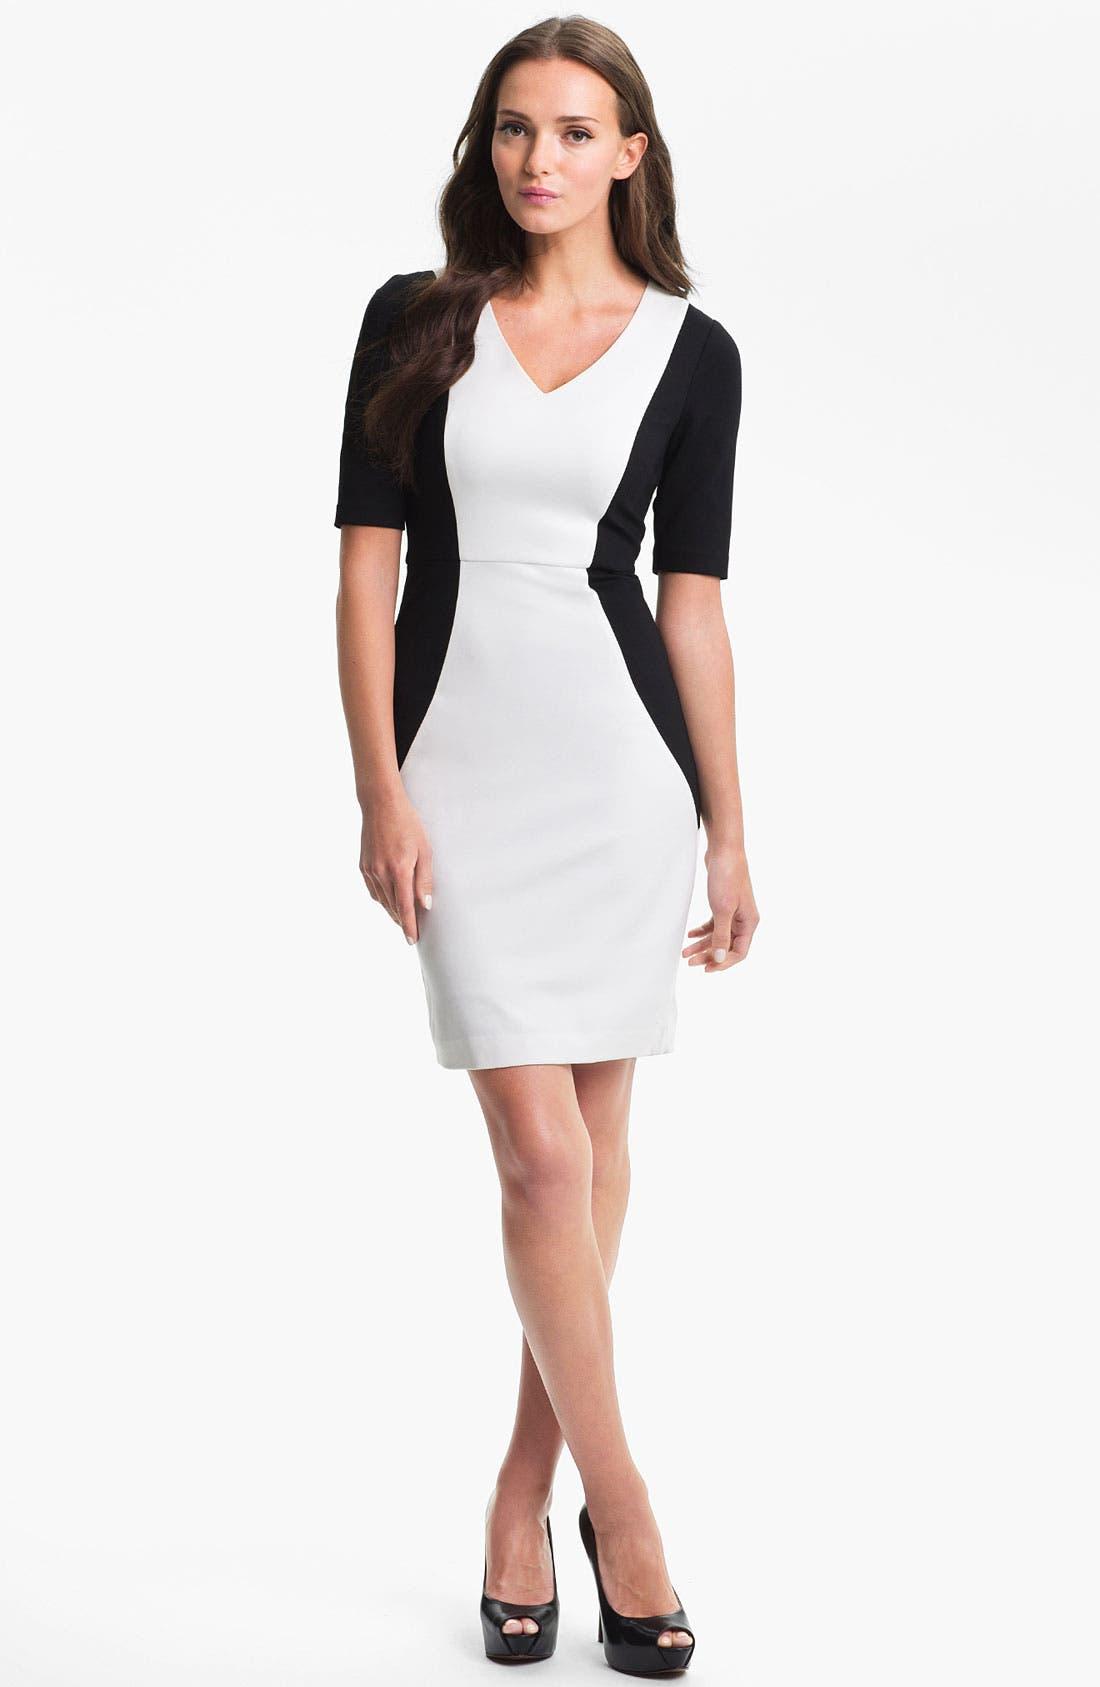 Alternate Image 1 Selected - Trina Turk 'Vamp' Stretch Knit Sheath Dress